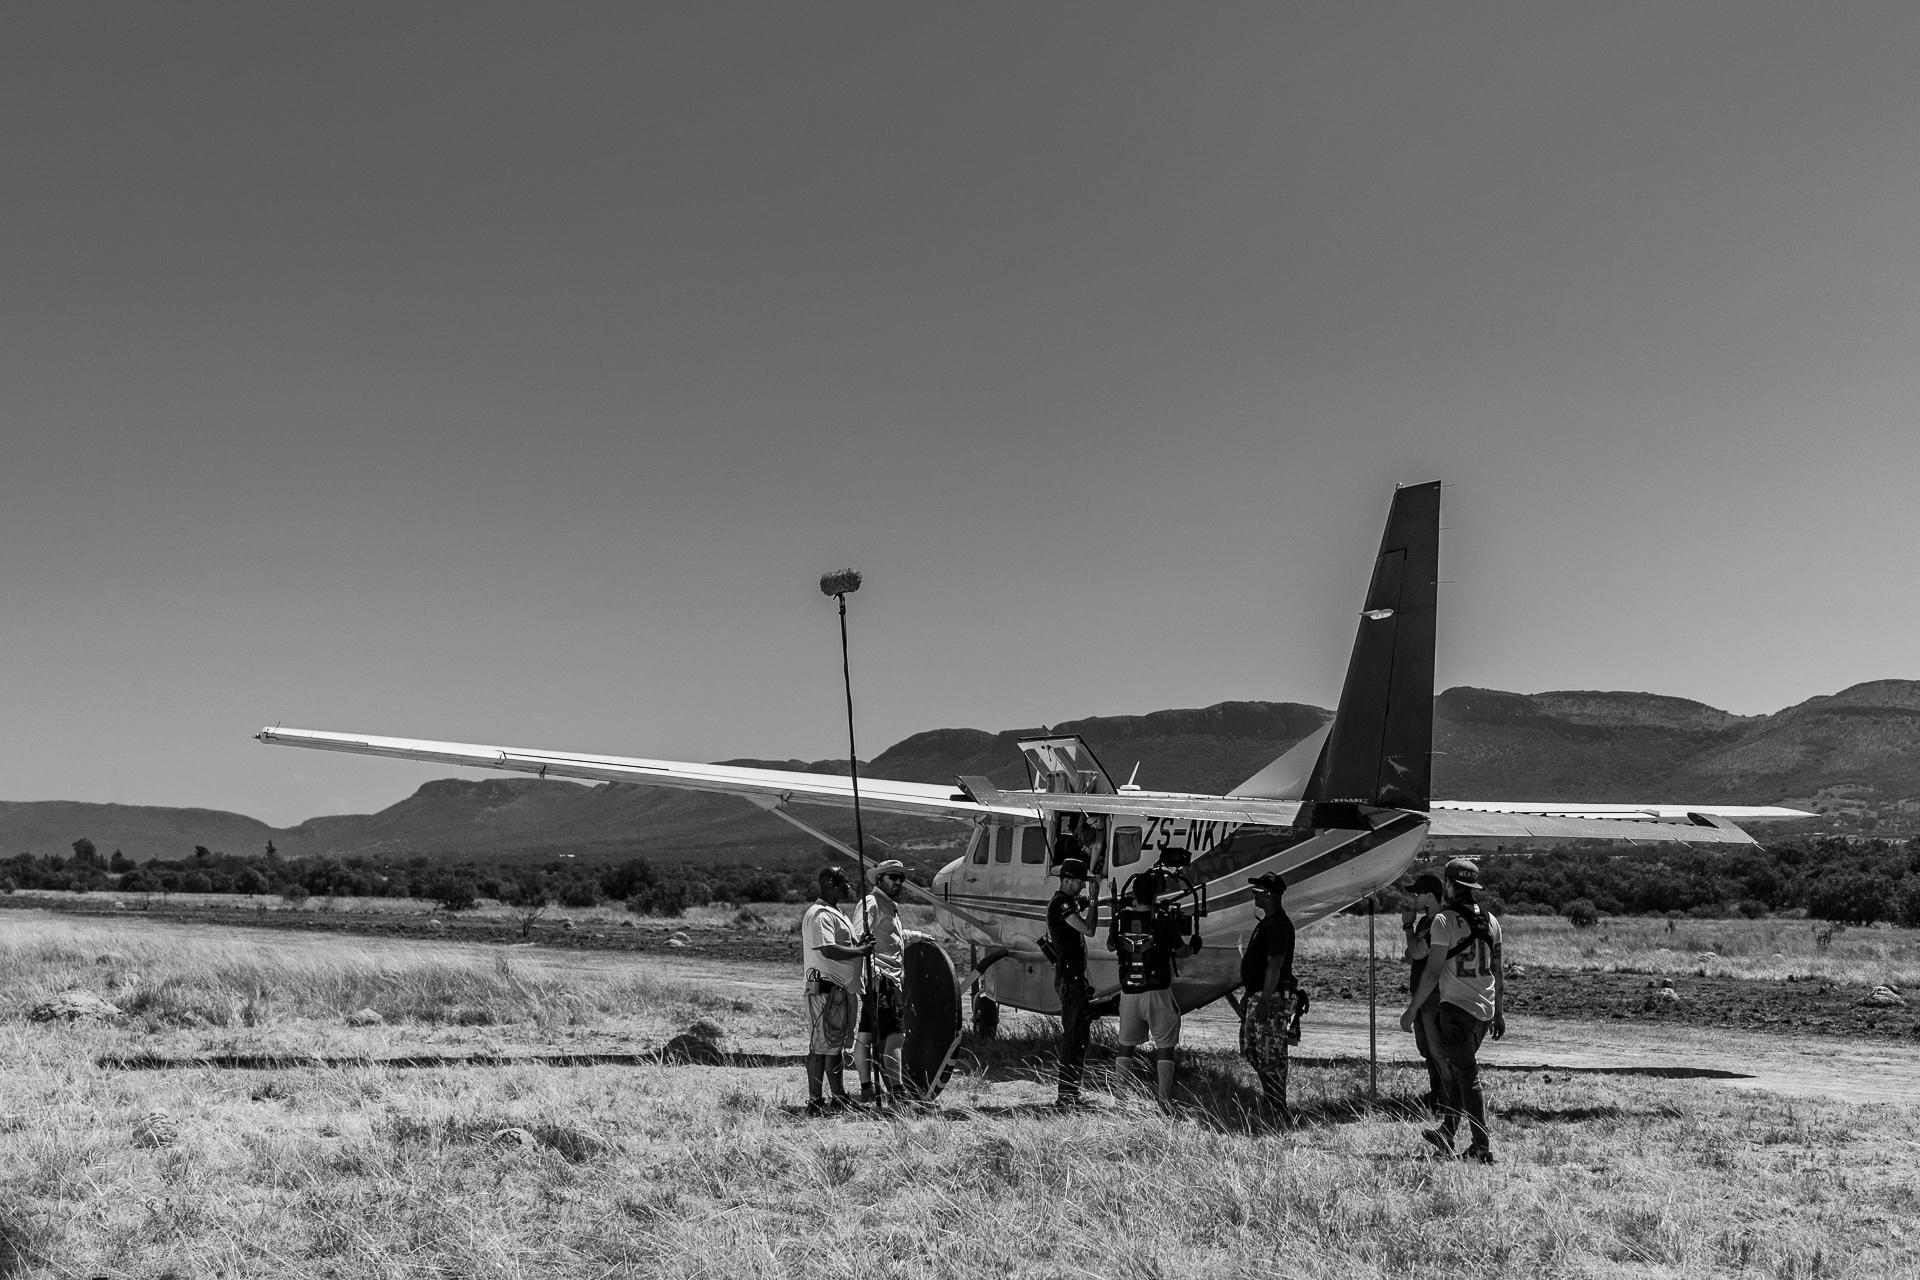 Shoot Day 06 of 22; Sc 18; Int / Ext. Bush runway in the Plane - Landing Strip: BTS.